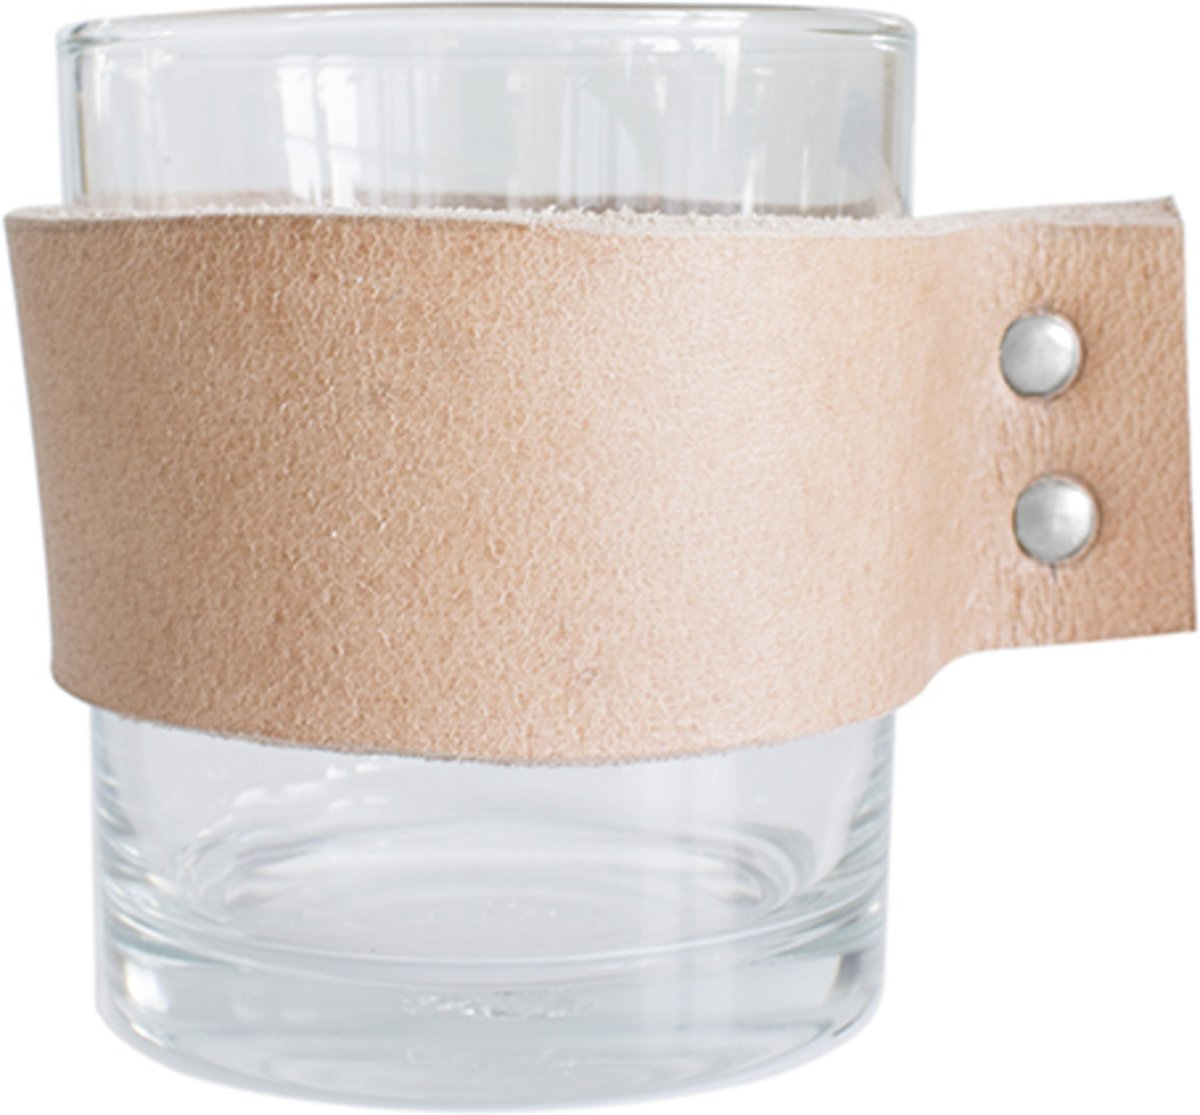 TAK Design Drinkglas Wrap Me - Incl. Lederen Band - Glas - ?8 x 9 cm - Bruin